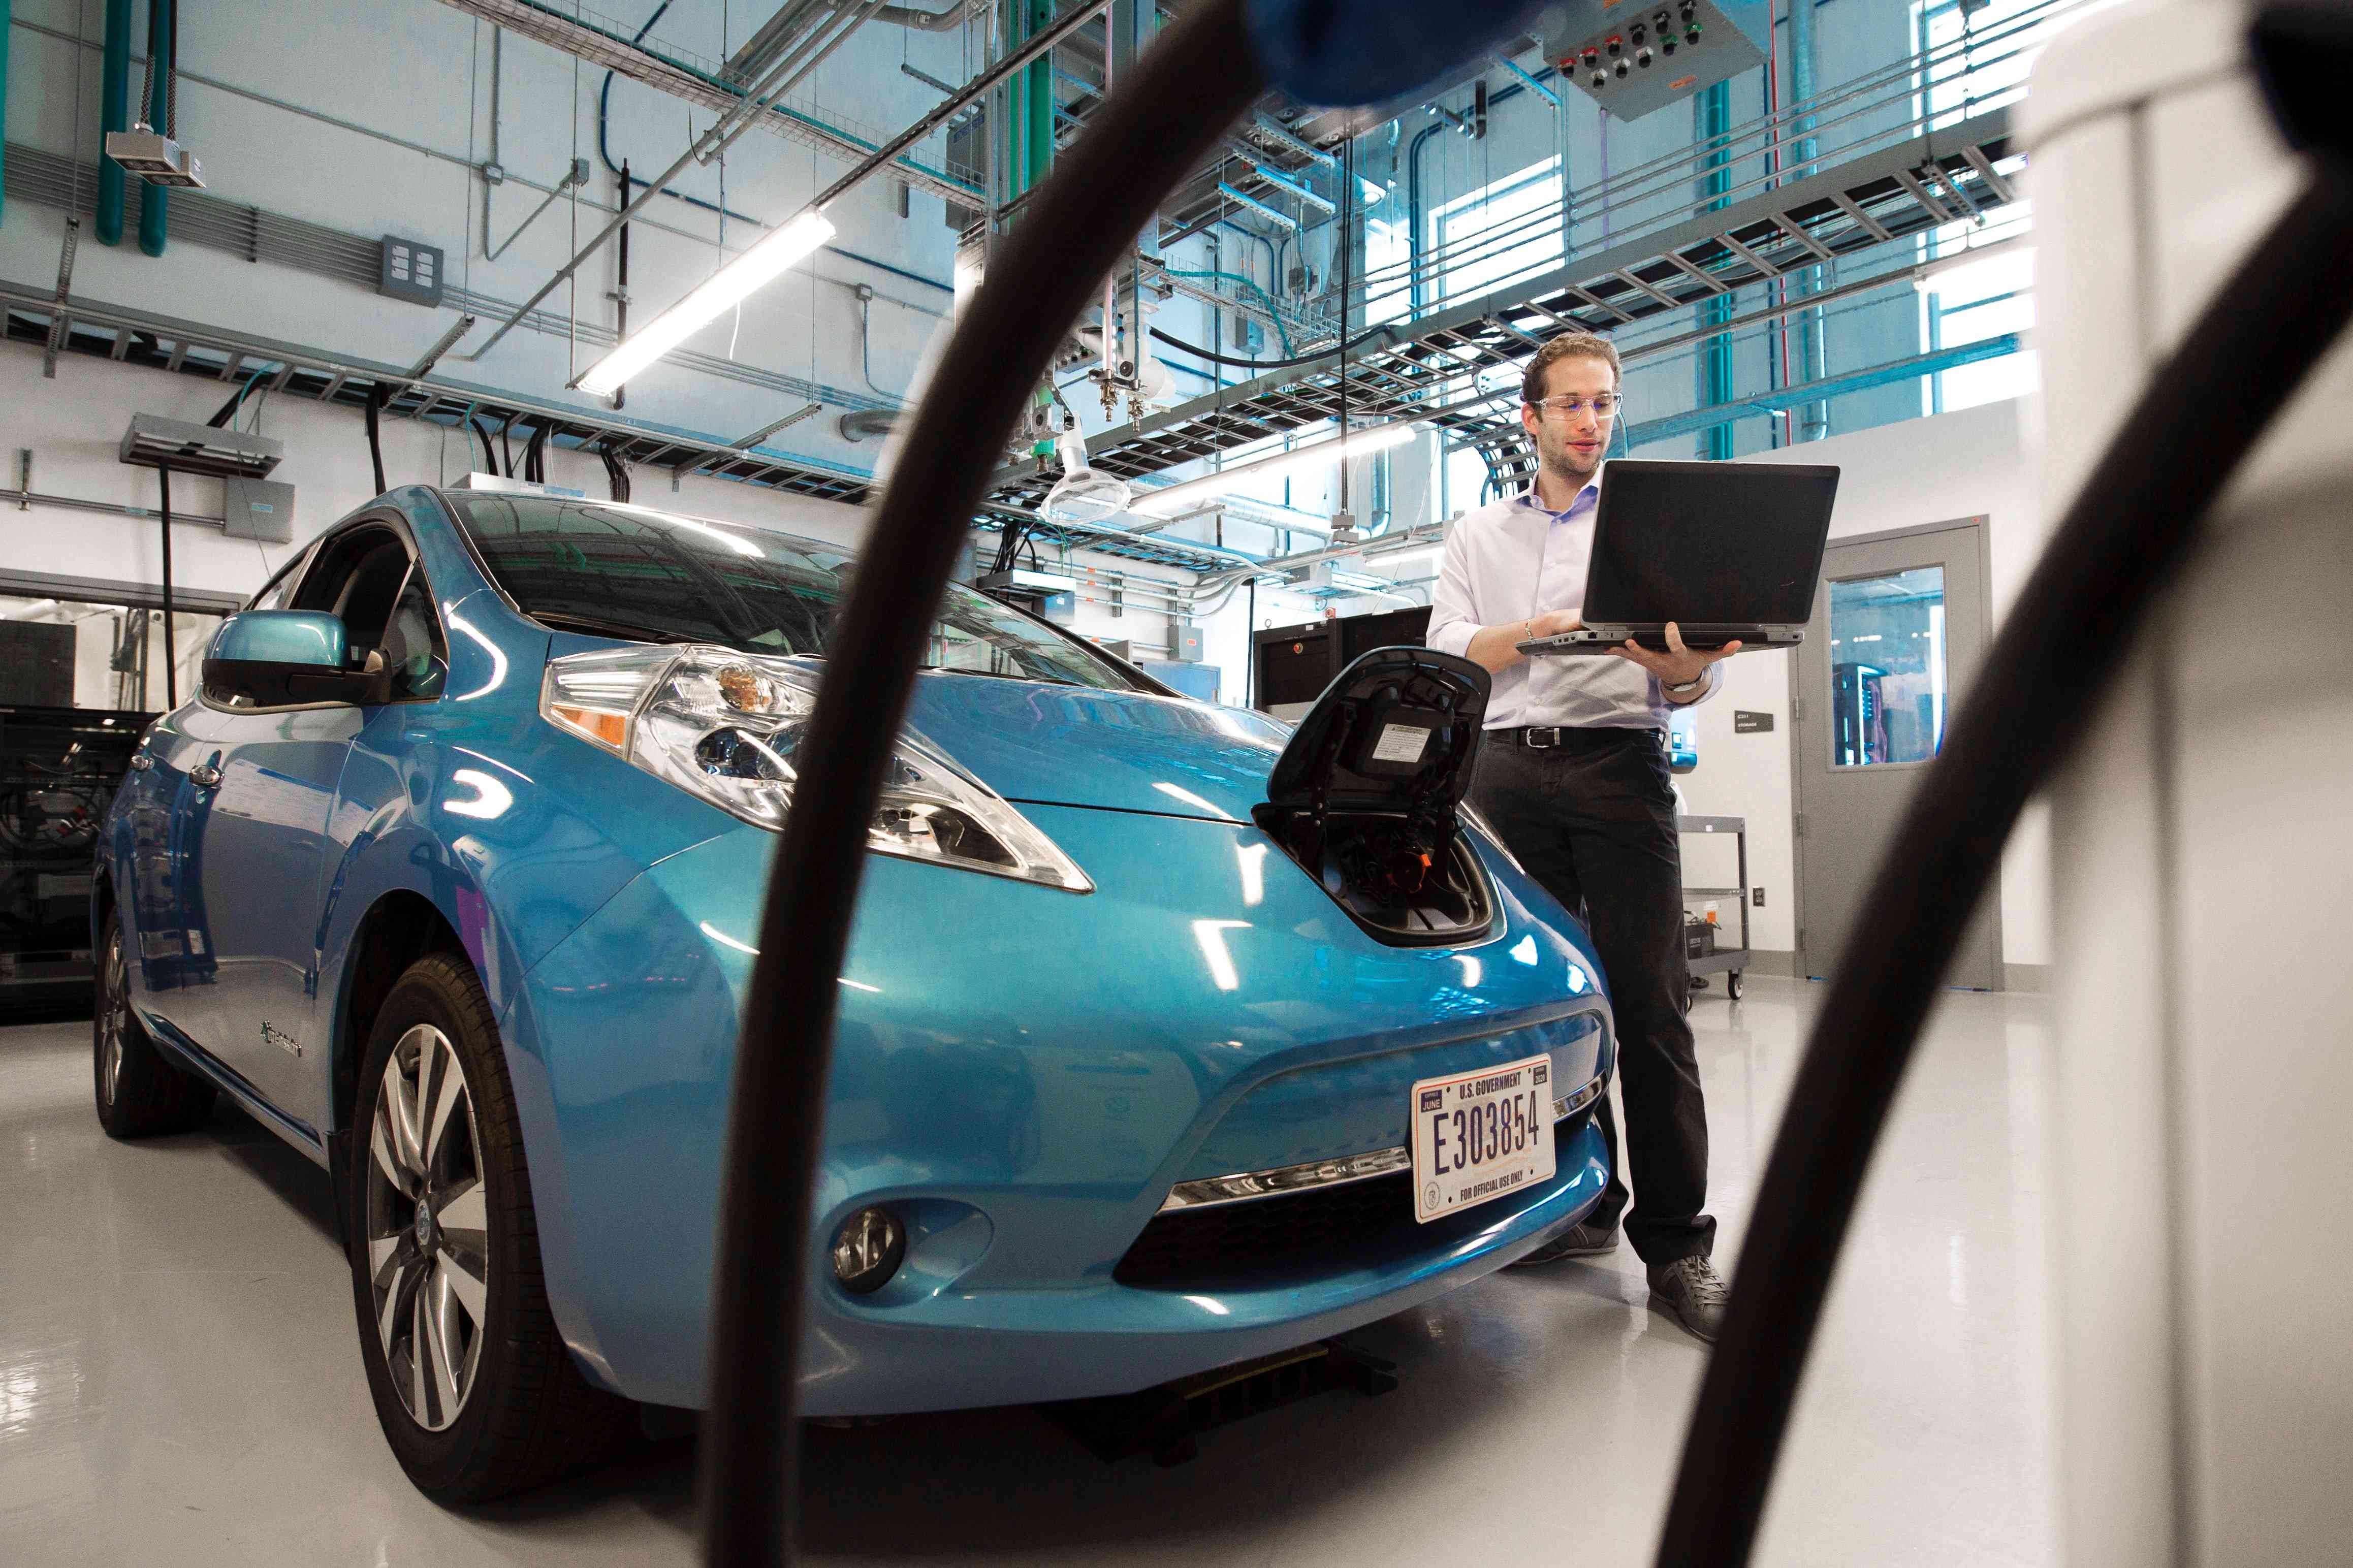 An electric vehicle in a repair shop.